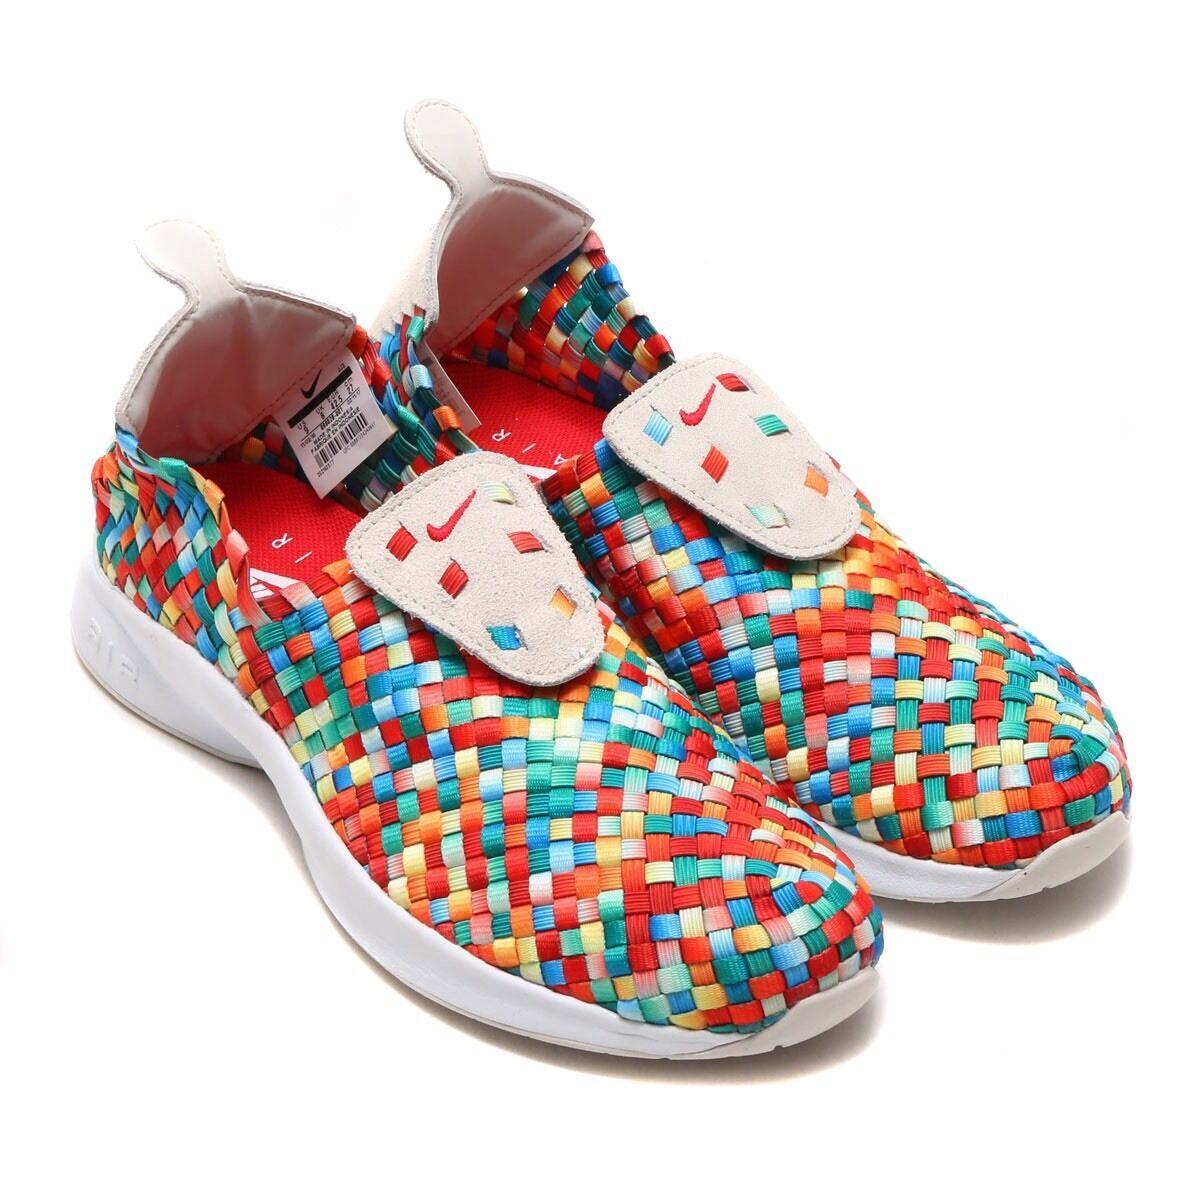 Nike Light Air Woven PMR Rainbow Light Nike hueso zapatos / Universidad Rojo 0b7f2b